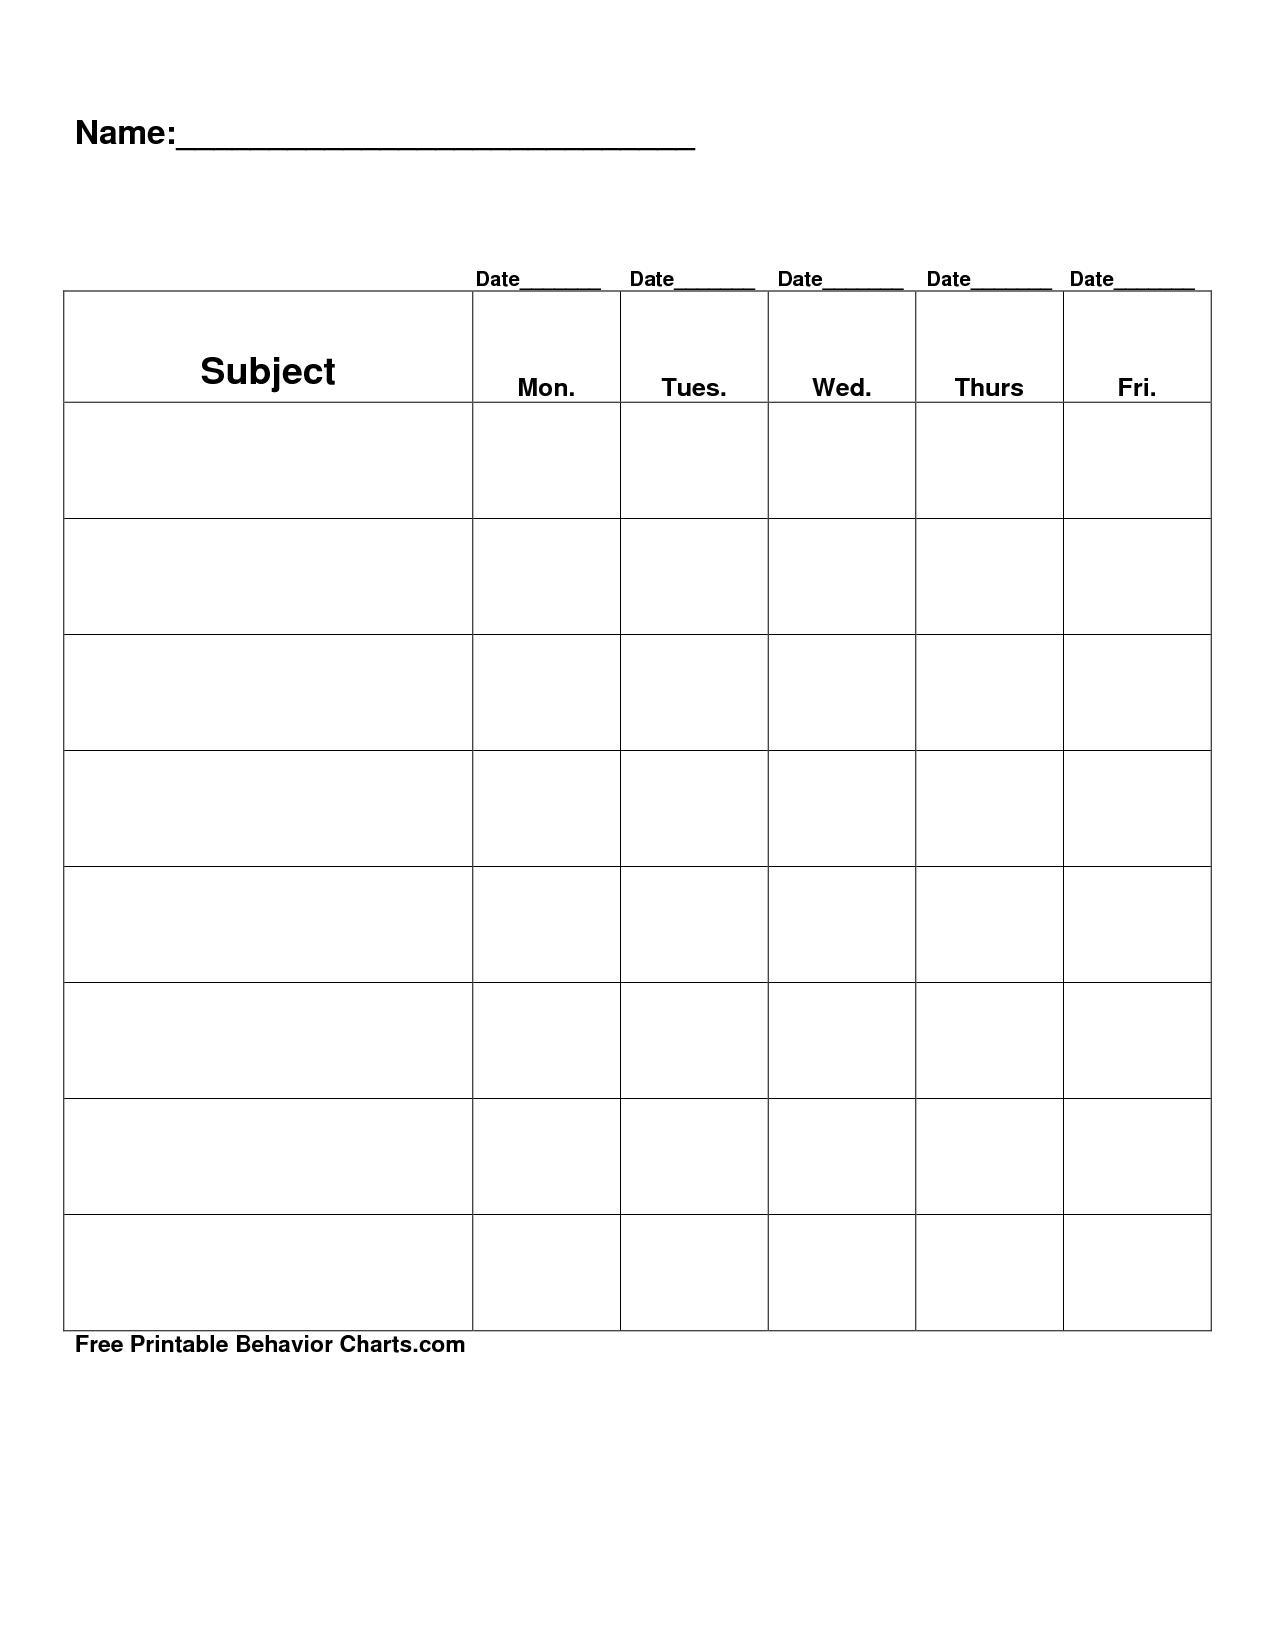 Free Printable Blank Charts | Free Printable Behavior Charts